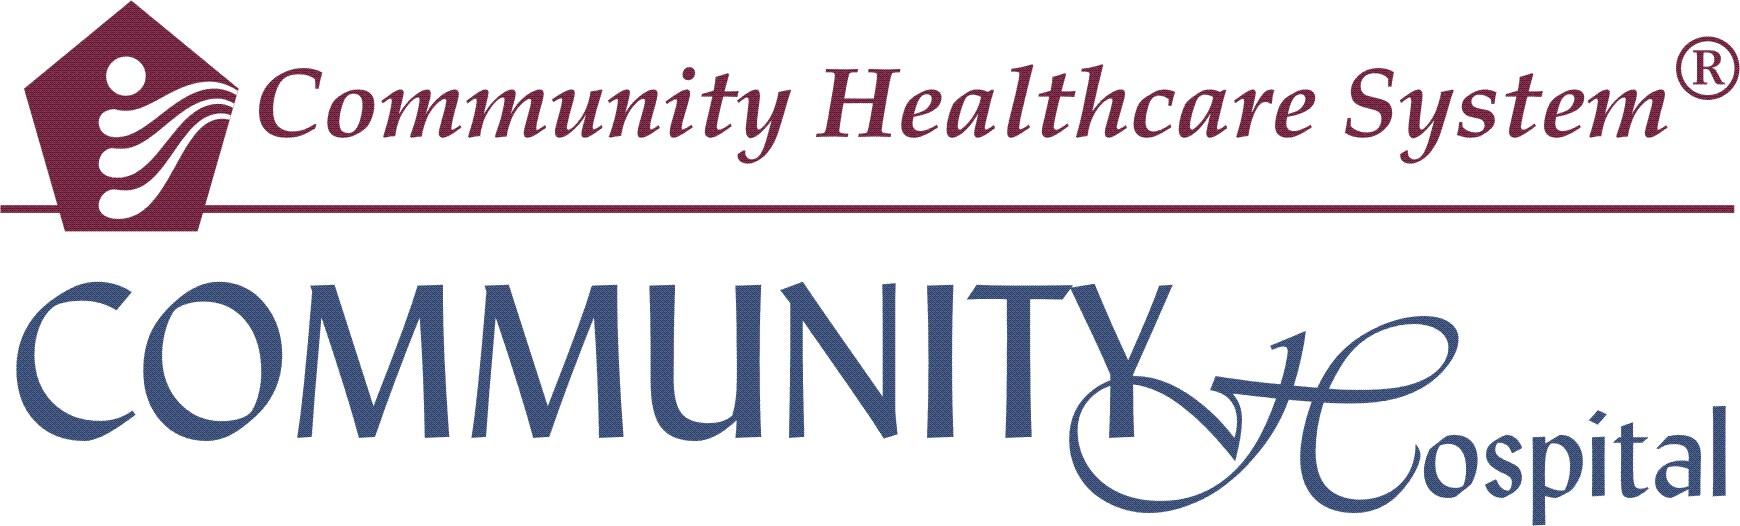 Community Hospital Munster